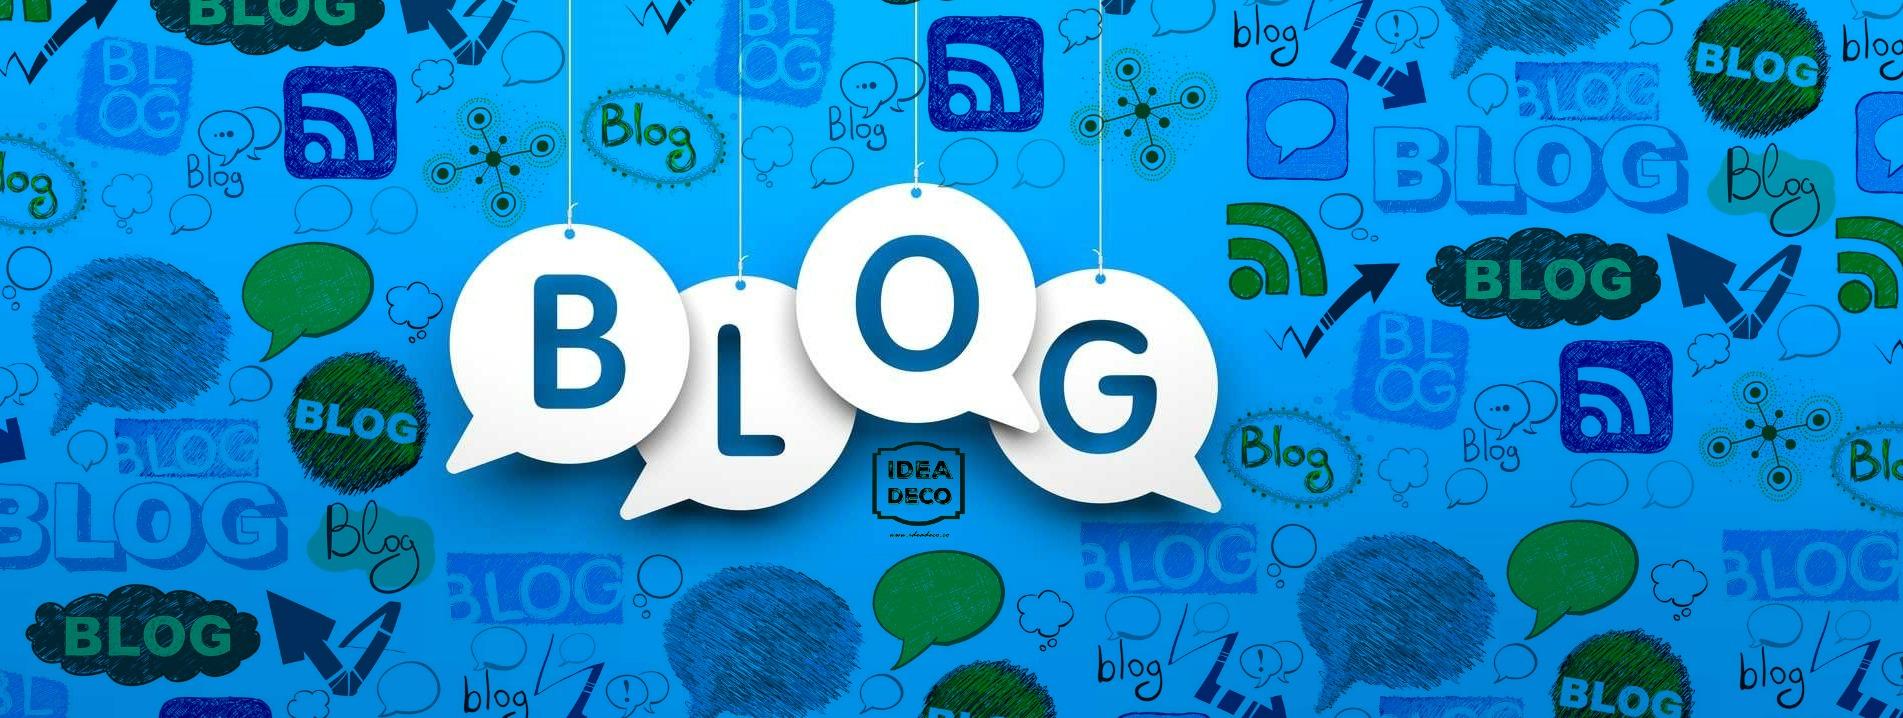 Why Do People Blog by Areti Vassou, Ideadeco